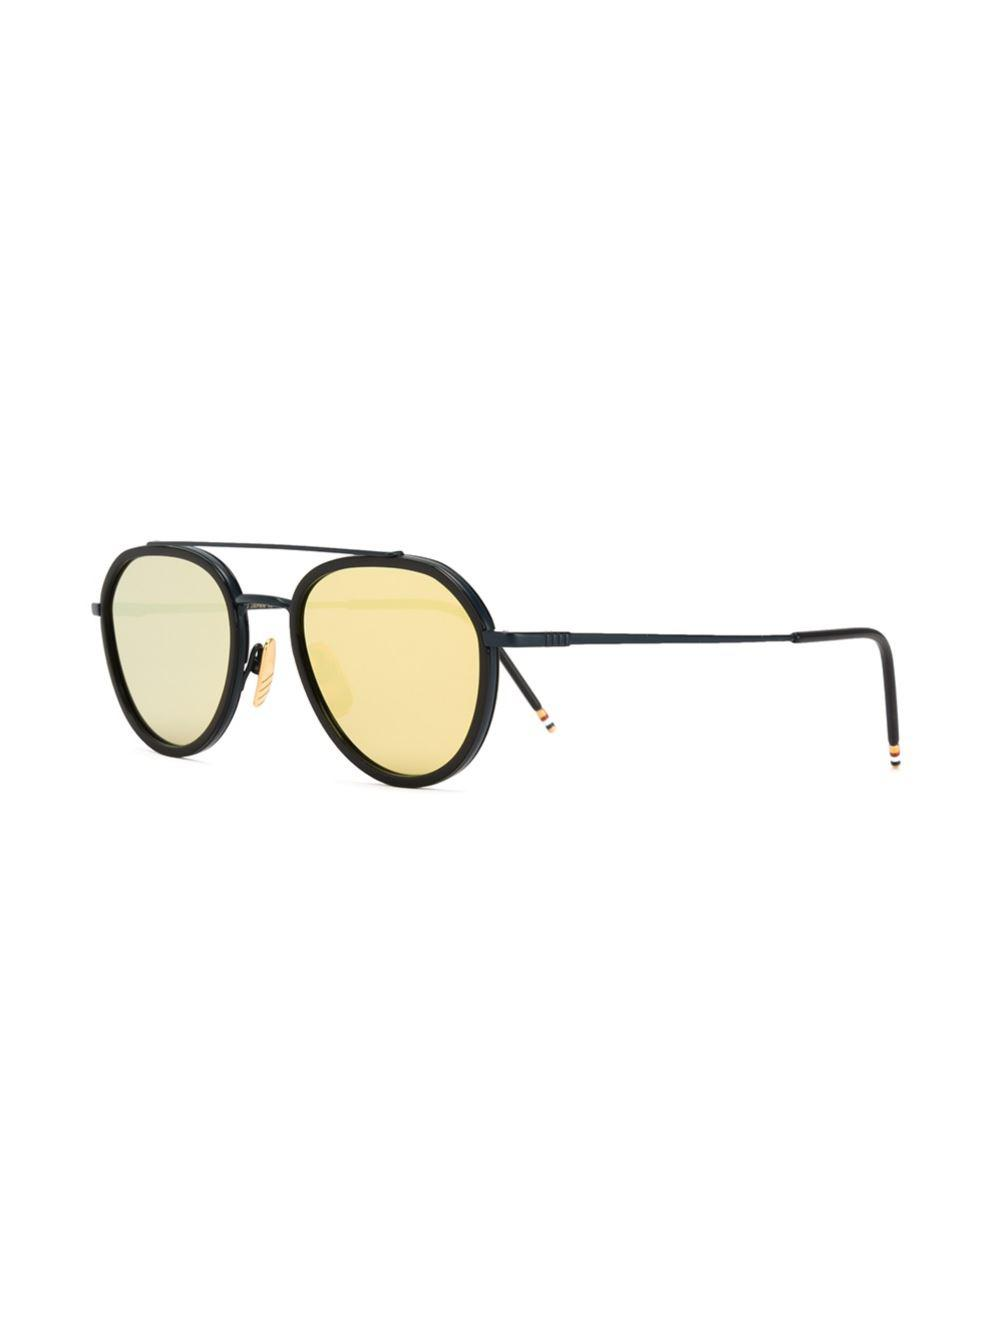 4418e7800740 Lyst - Thom Browne Round Frame Sunglasses in Black